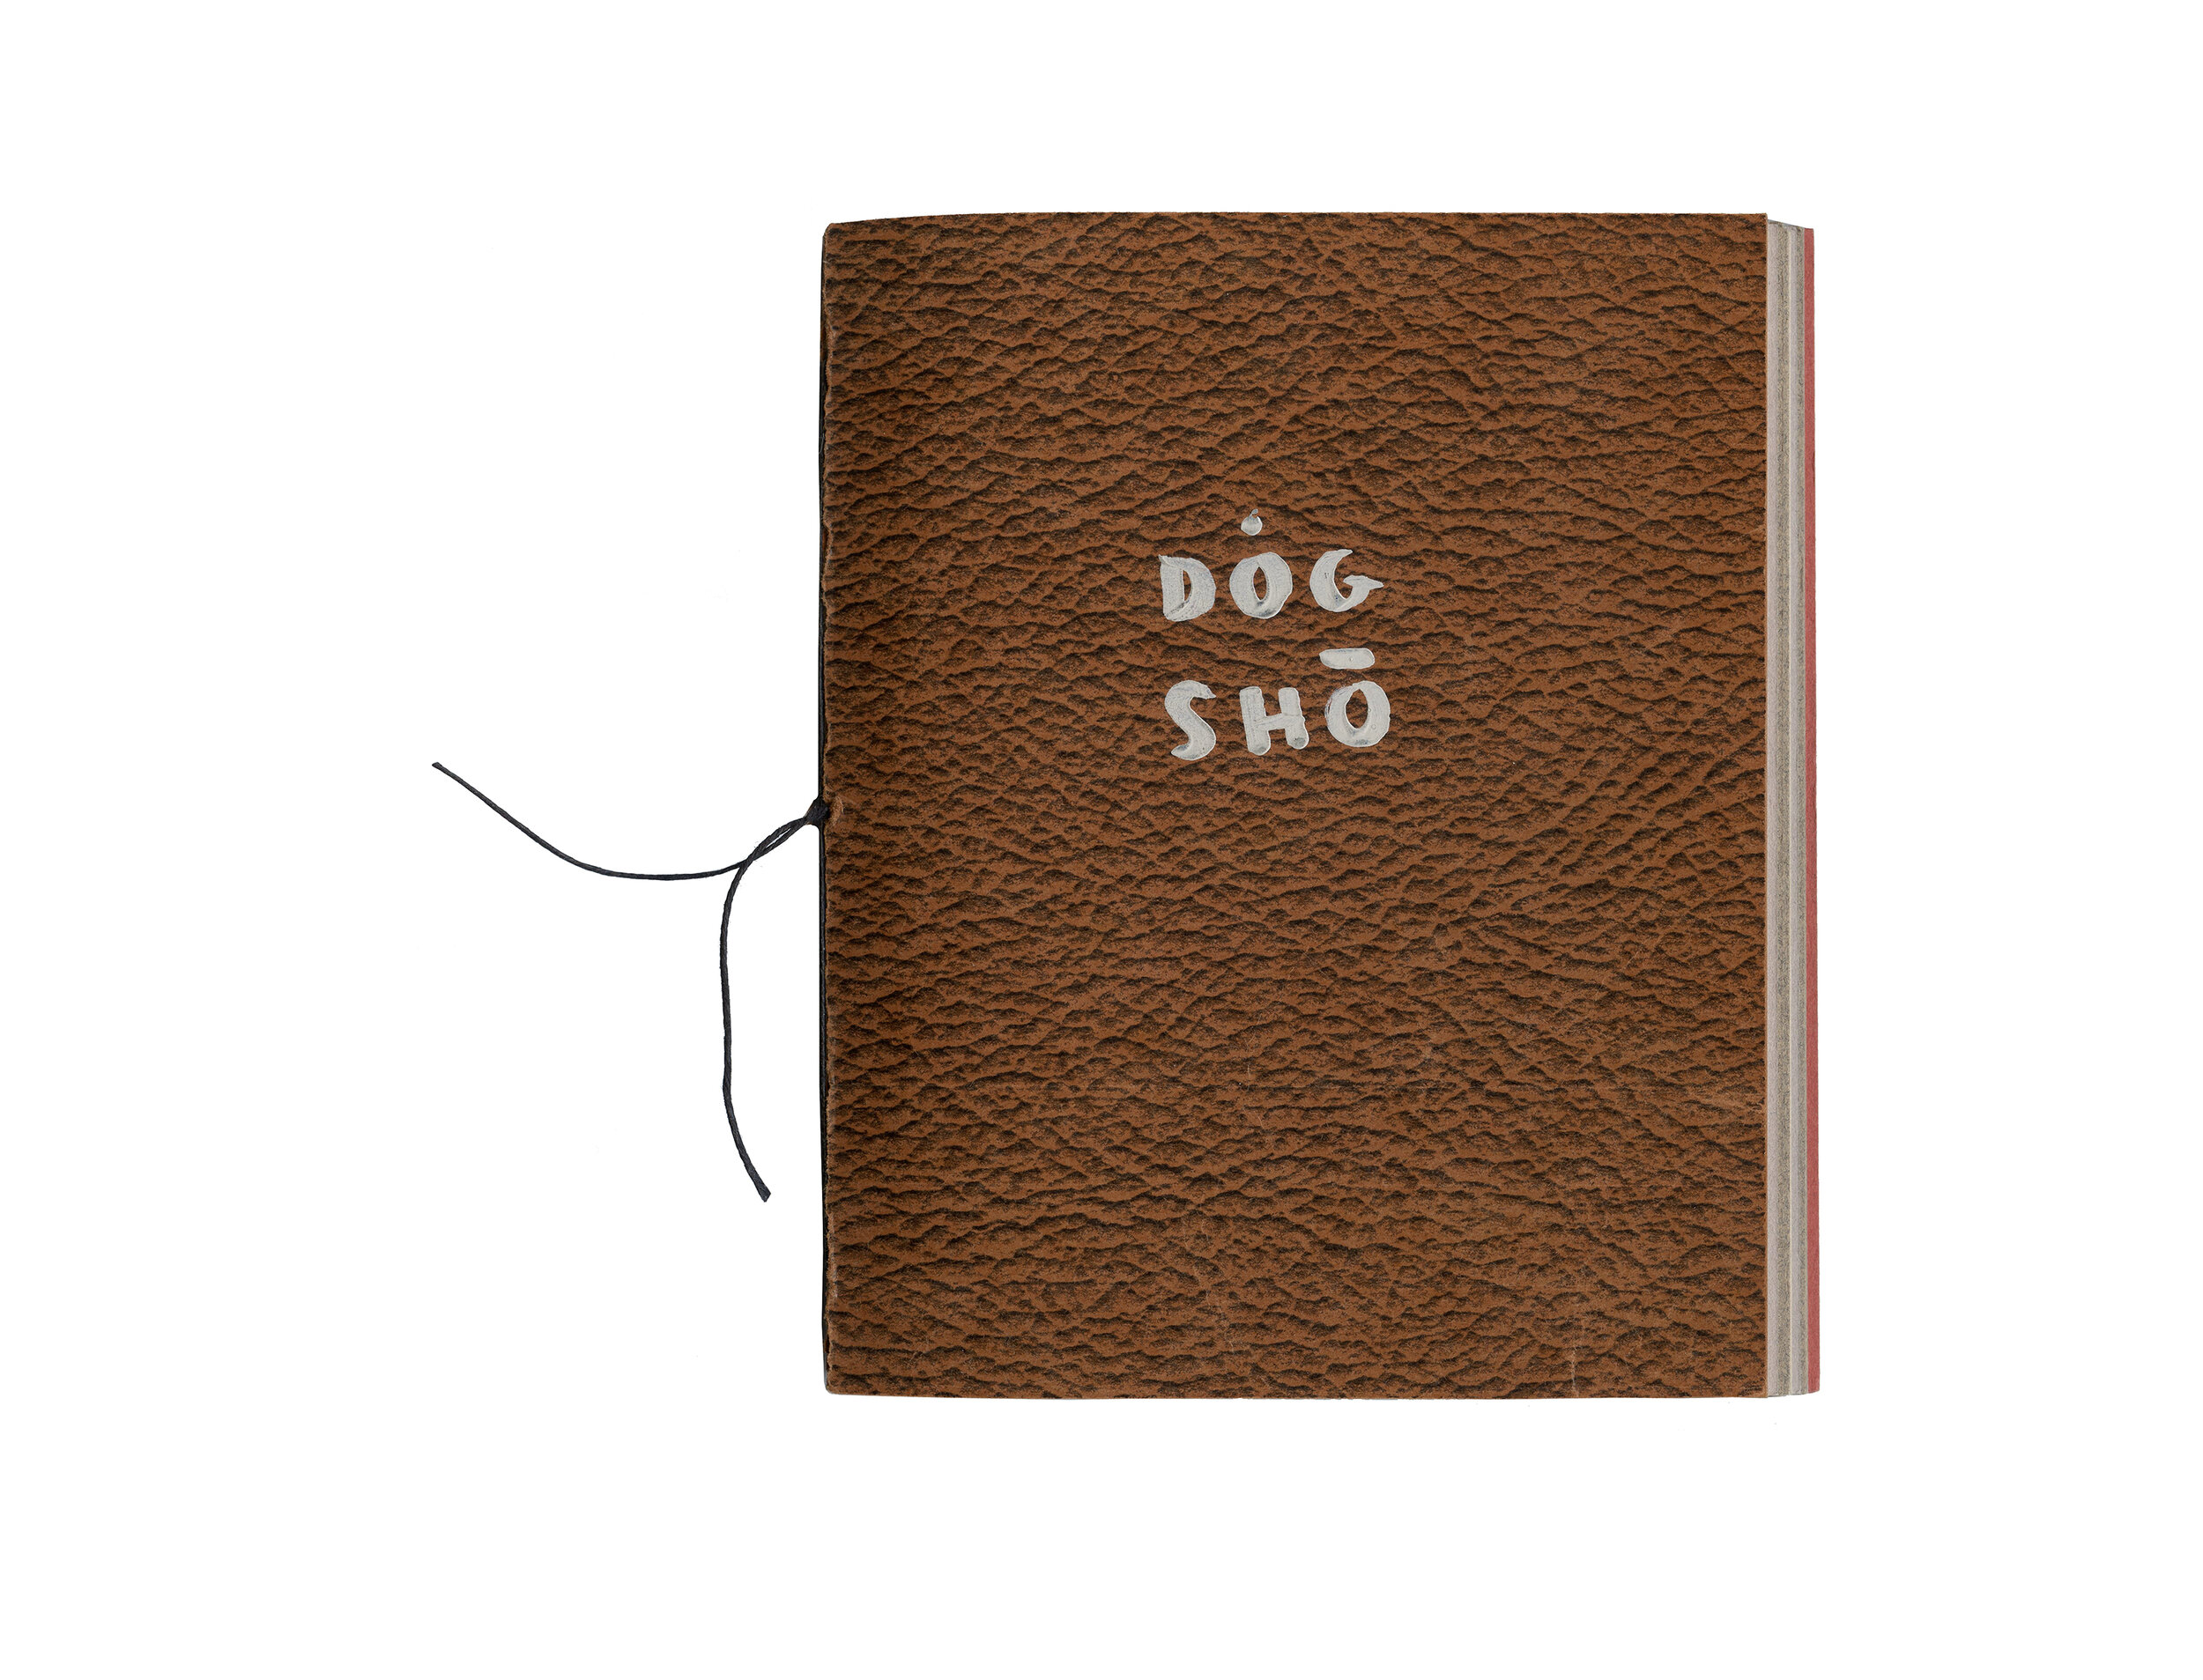 Dog_ShØ_001.jpg